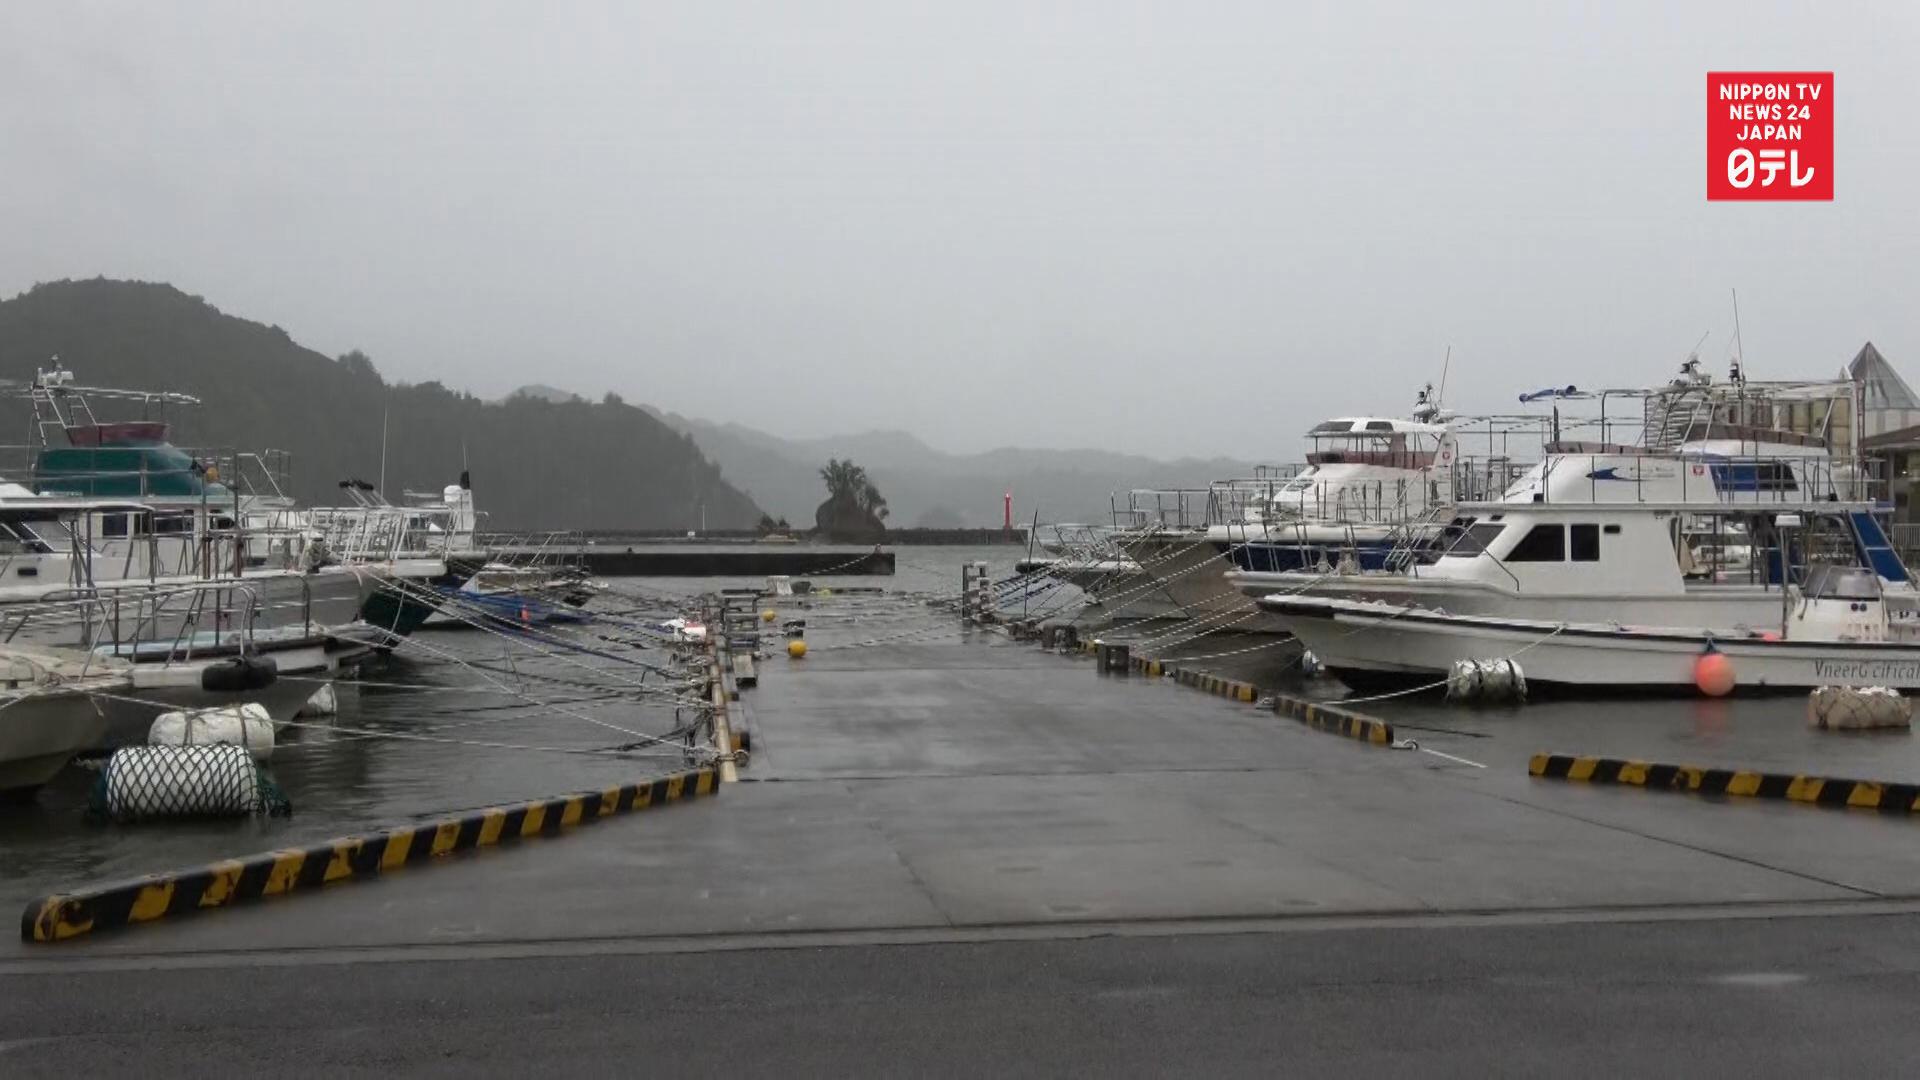 Flights, trains cancelled ahead of Super Typhoon Hagibis